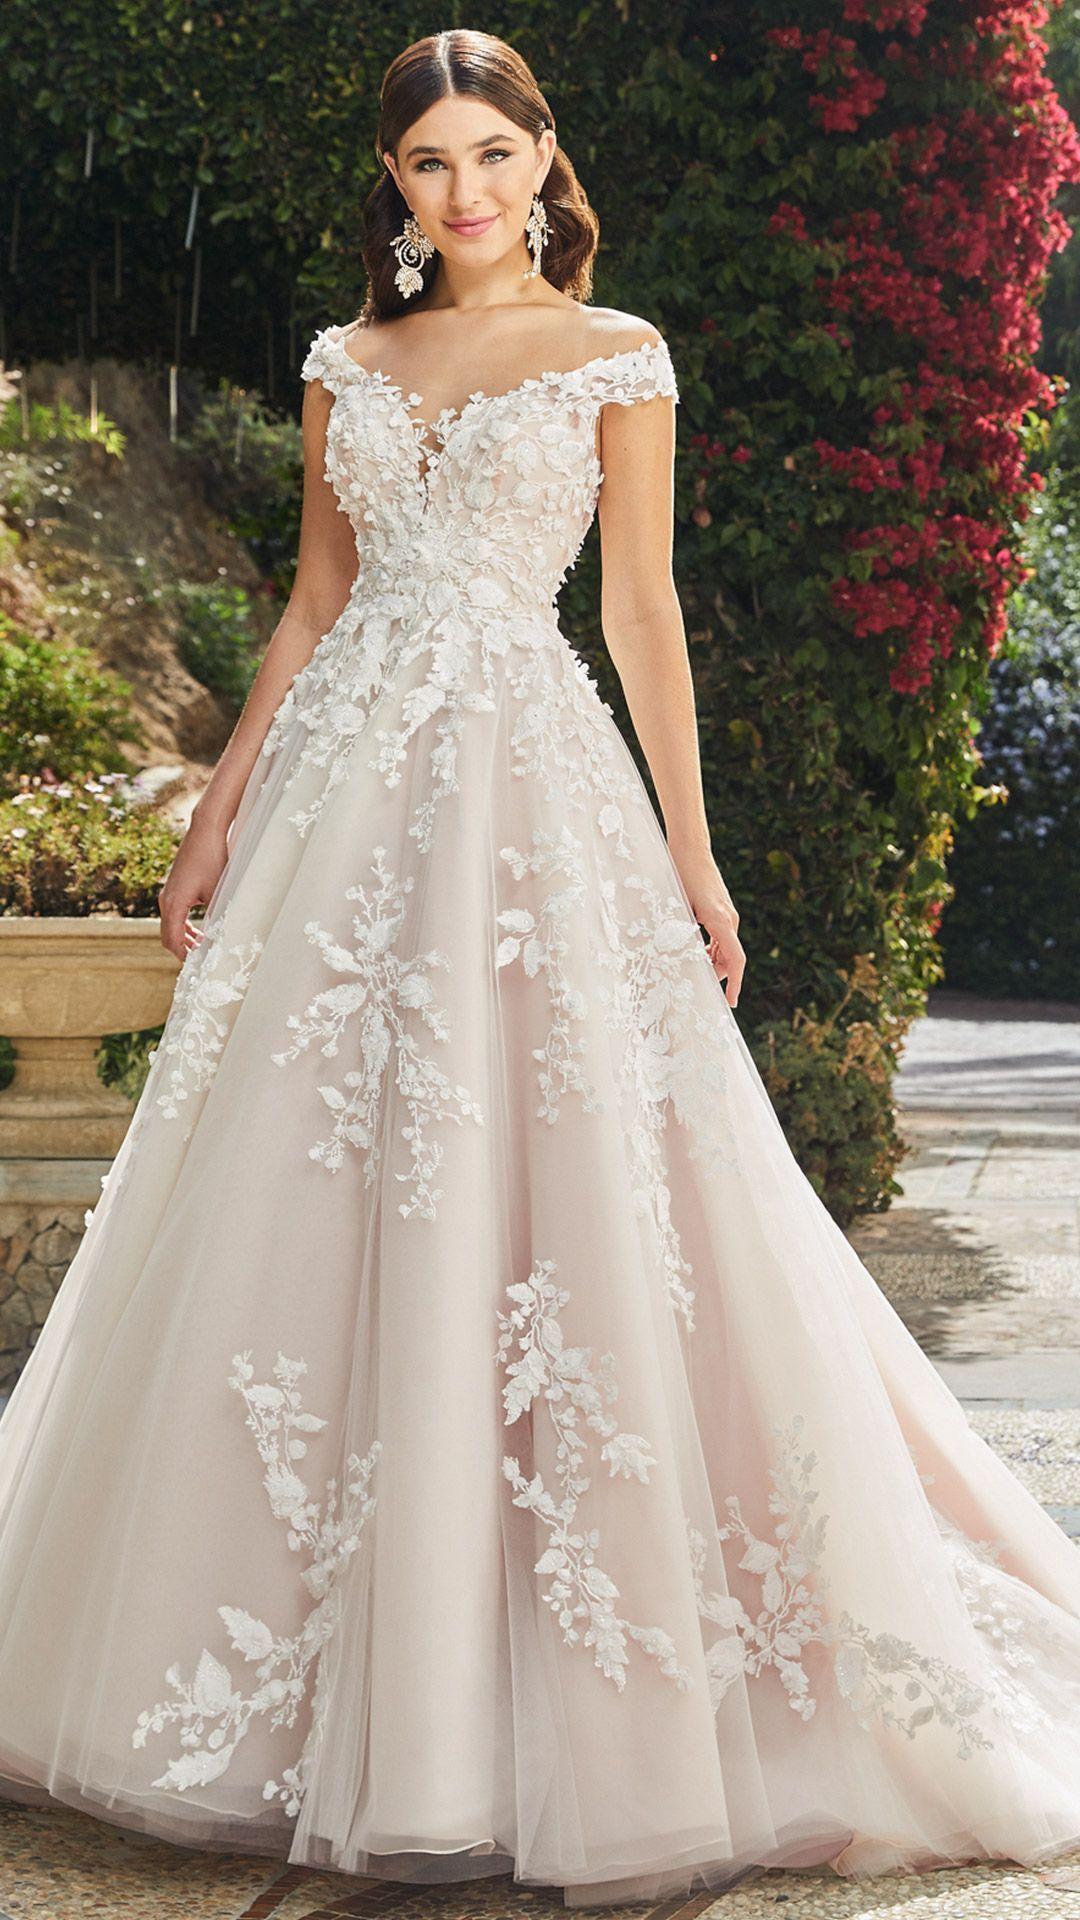 Pin On Latest Wedding Dresses More [ 1920 x 1080 Pixel ]